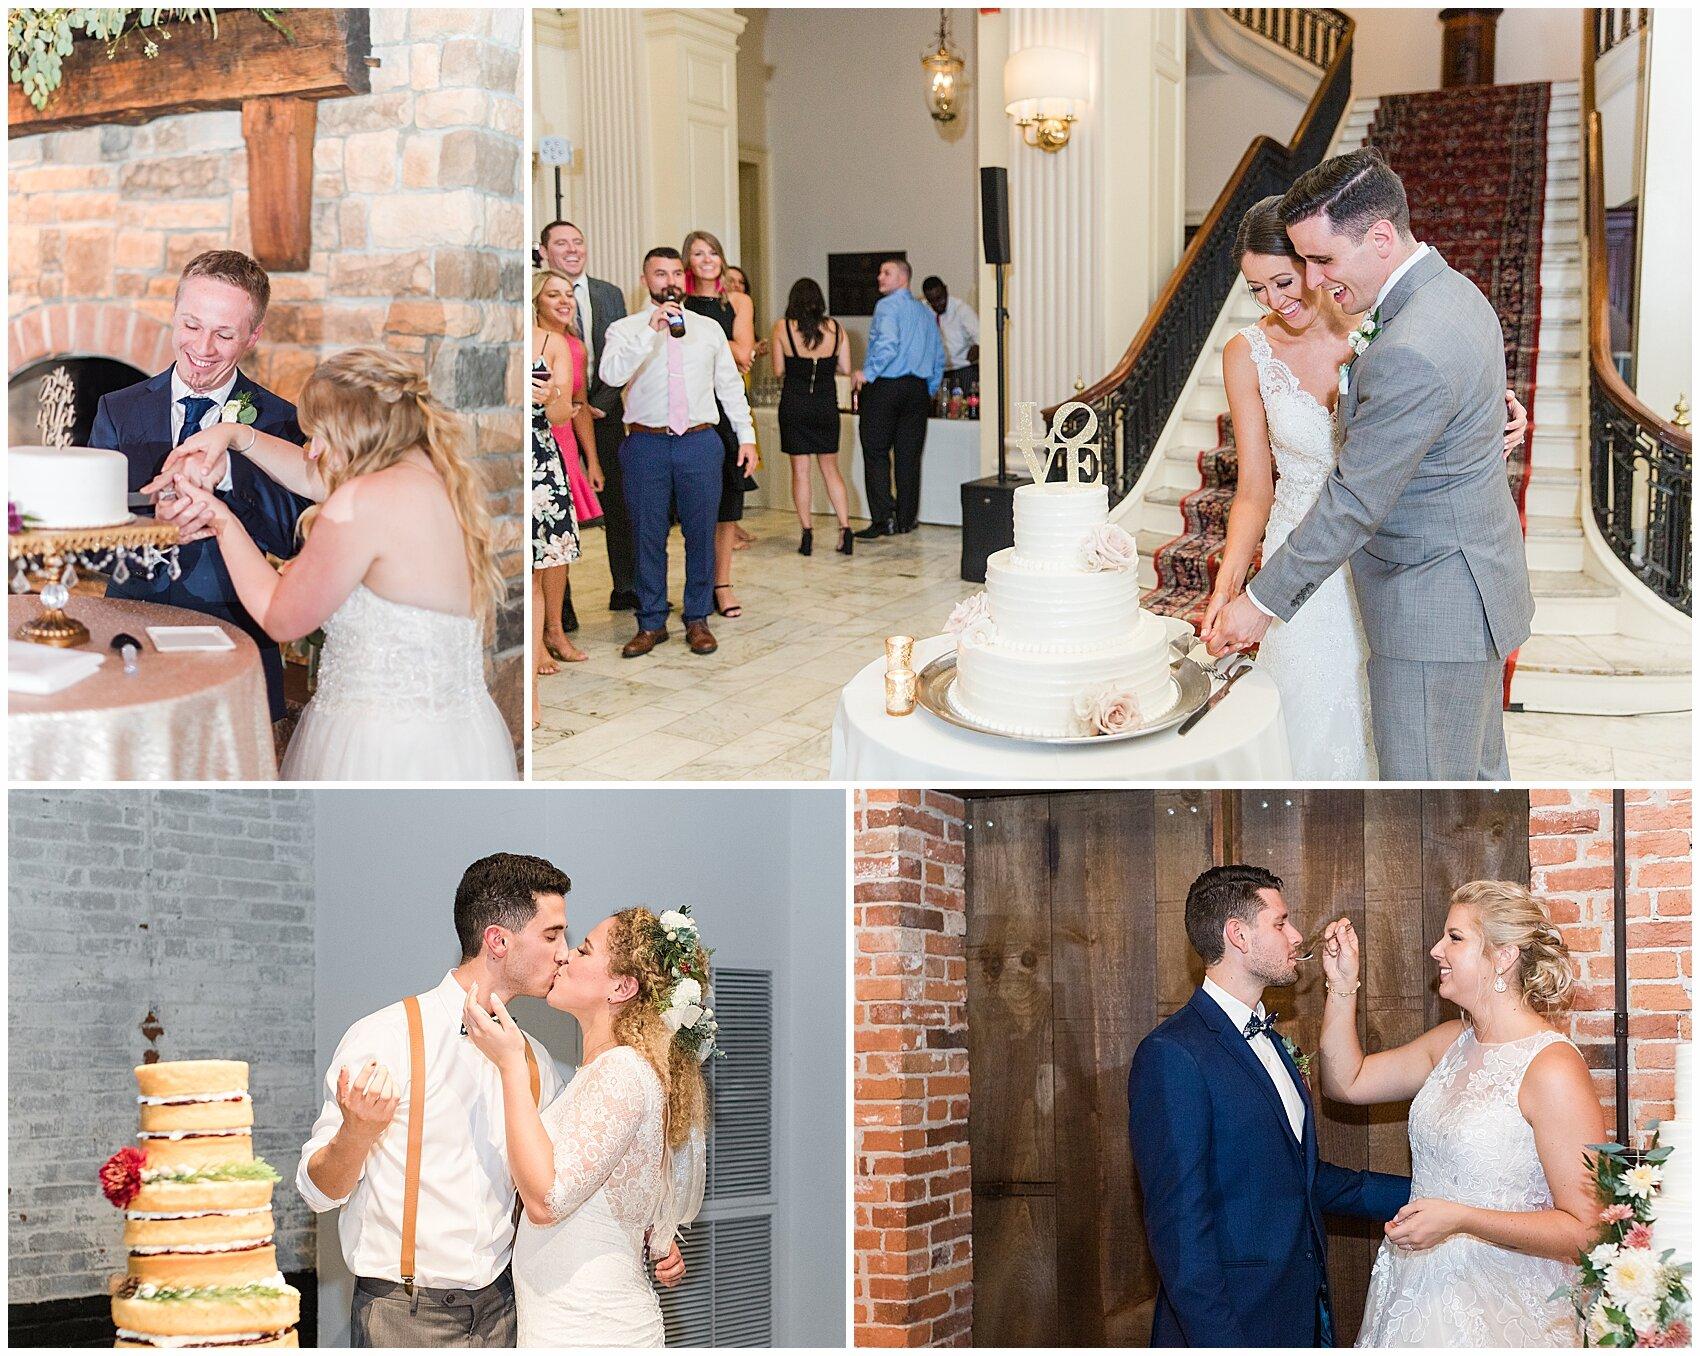 HOW-TO-CUT-A-WEDDING-CAKE_0006.jpg